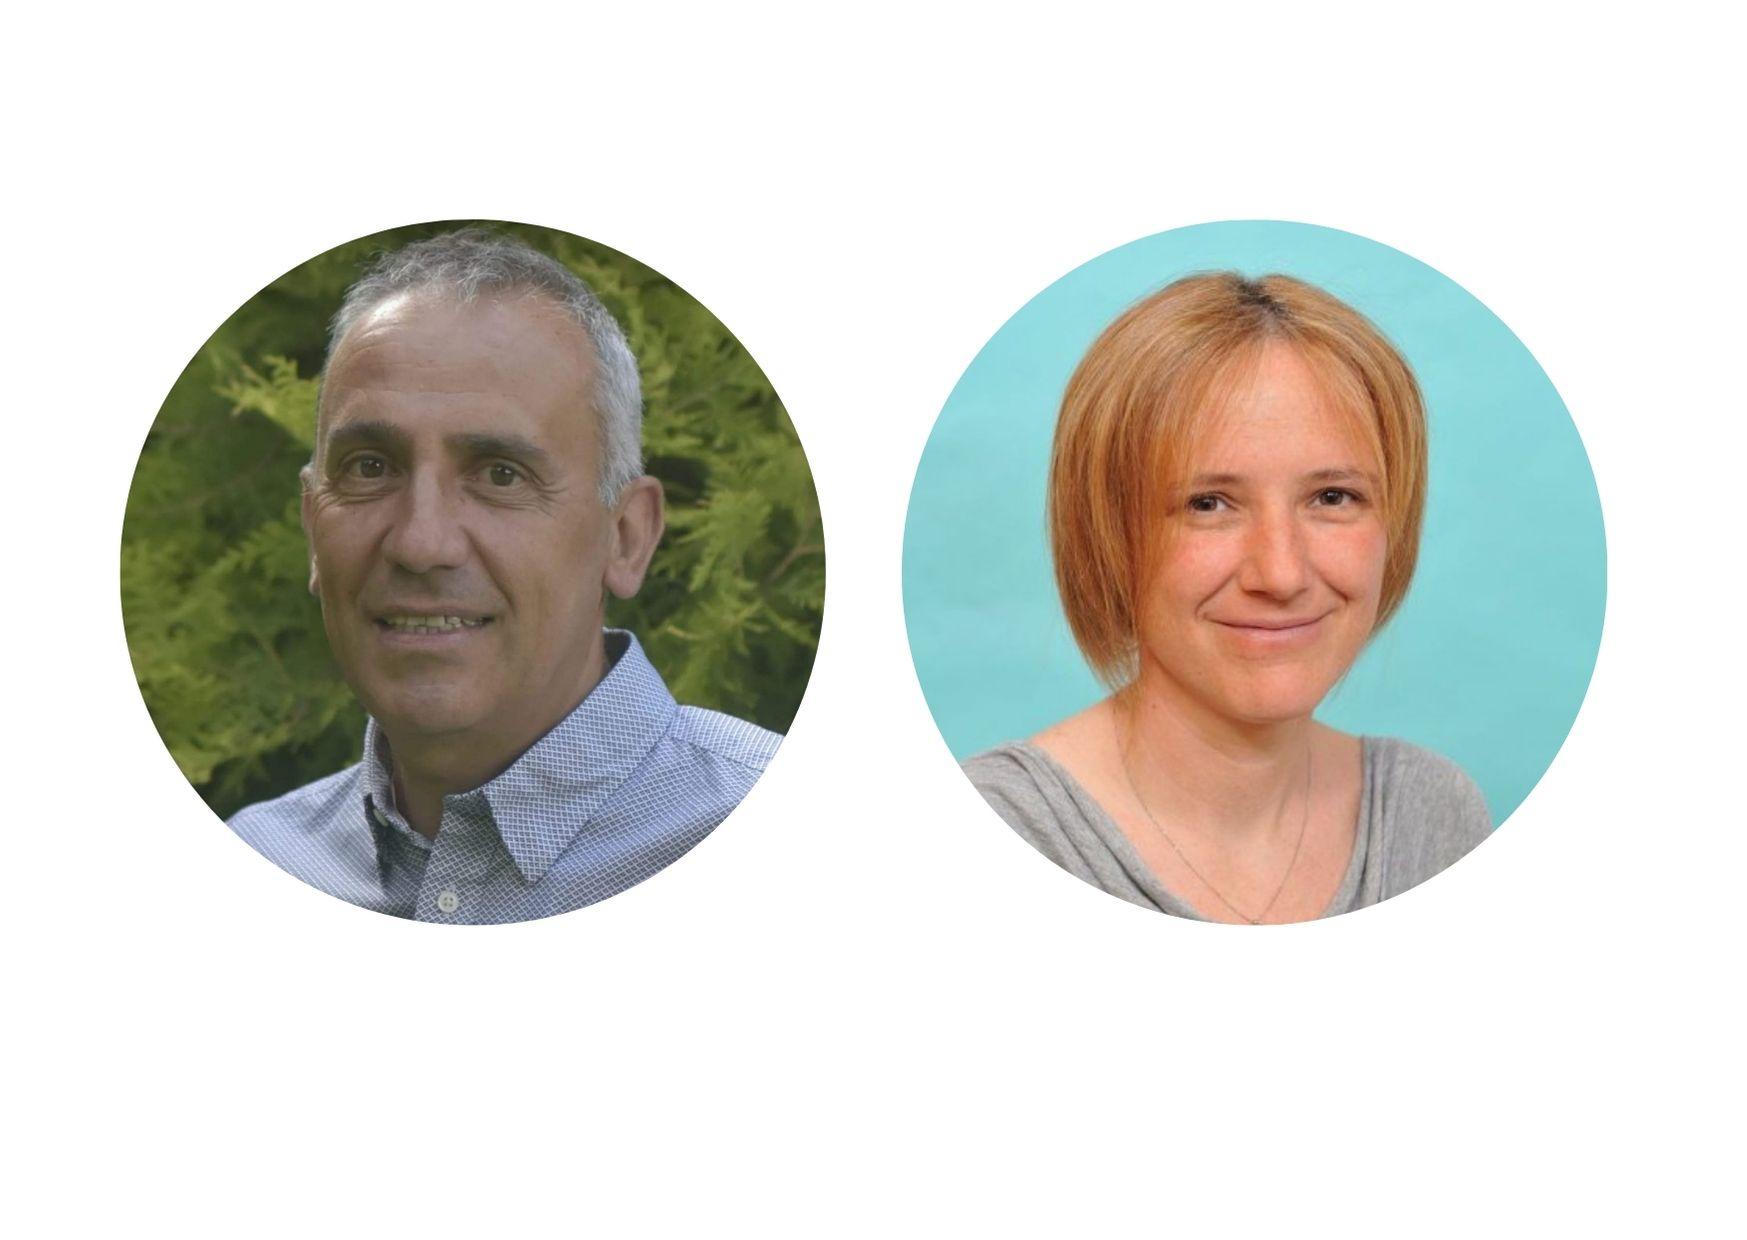 Leo Martinet e Ilaria Lavoyer - Candidati Sindaci Pontey